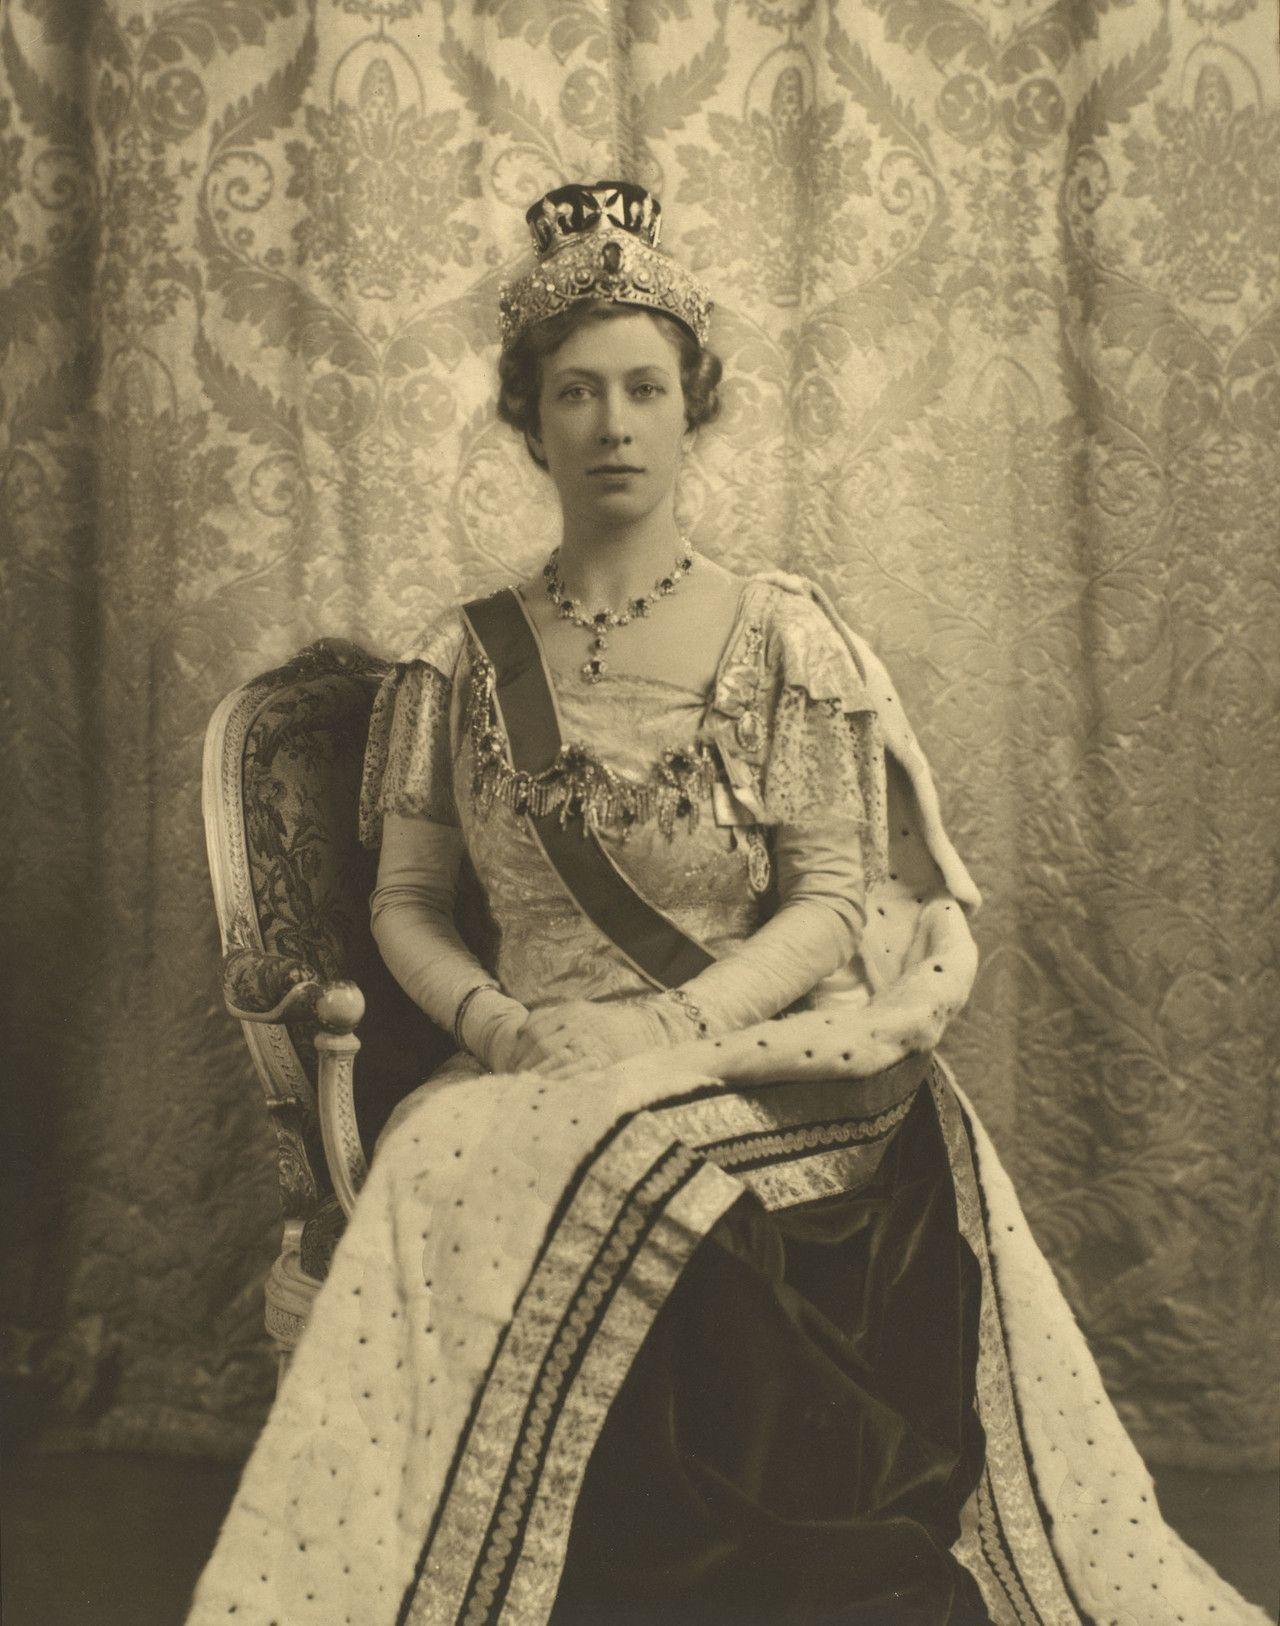 Princess Mary of the United Kingdom, The Princess Royal